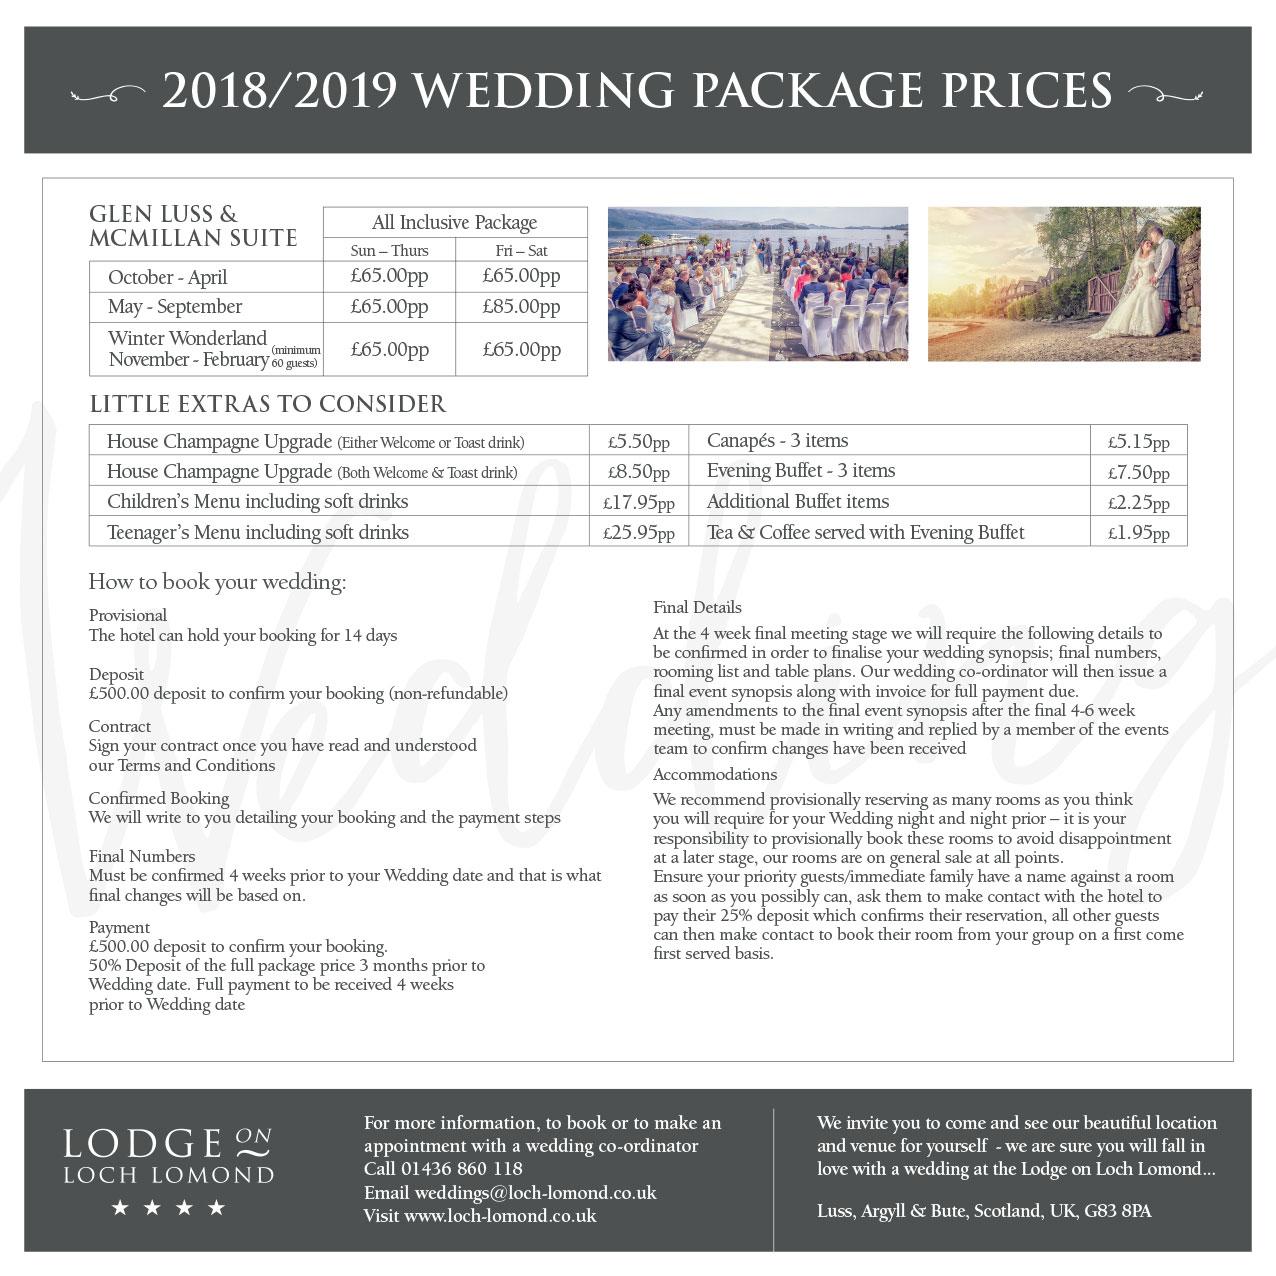 Groupon wedding deals 2018 scotland